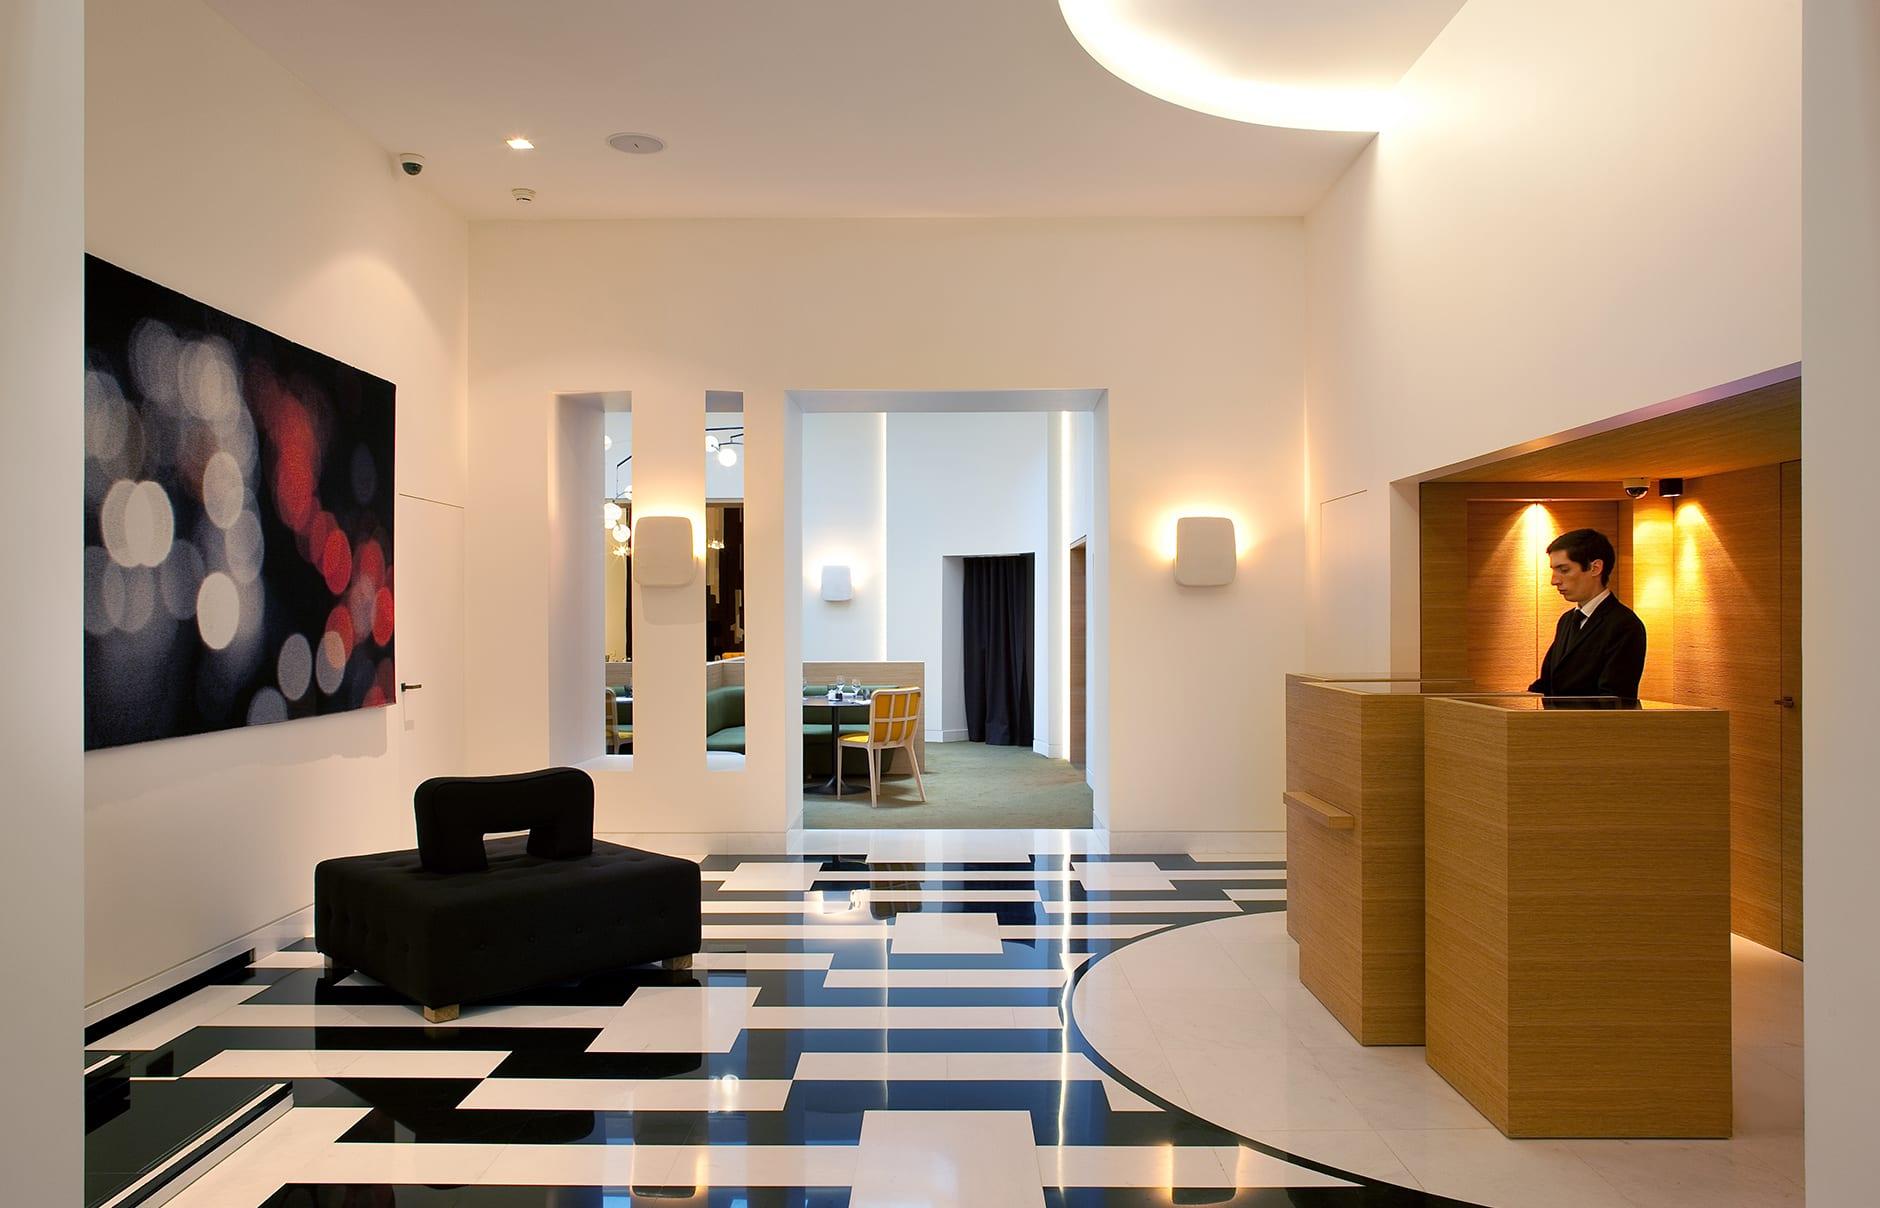 Reception. Marignan Paris, France. © Marignan